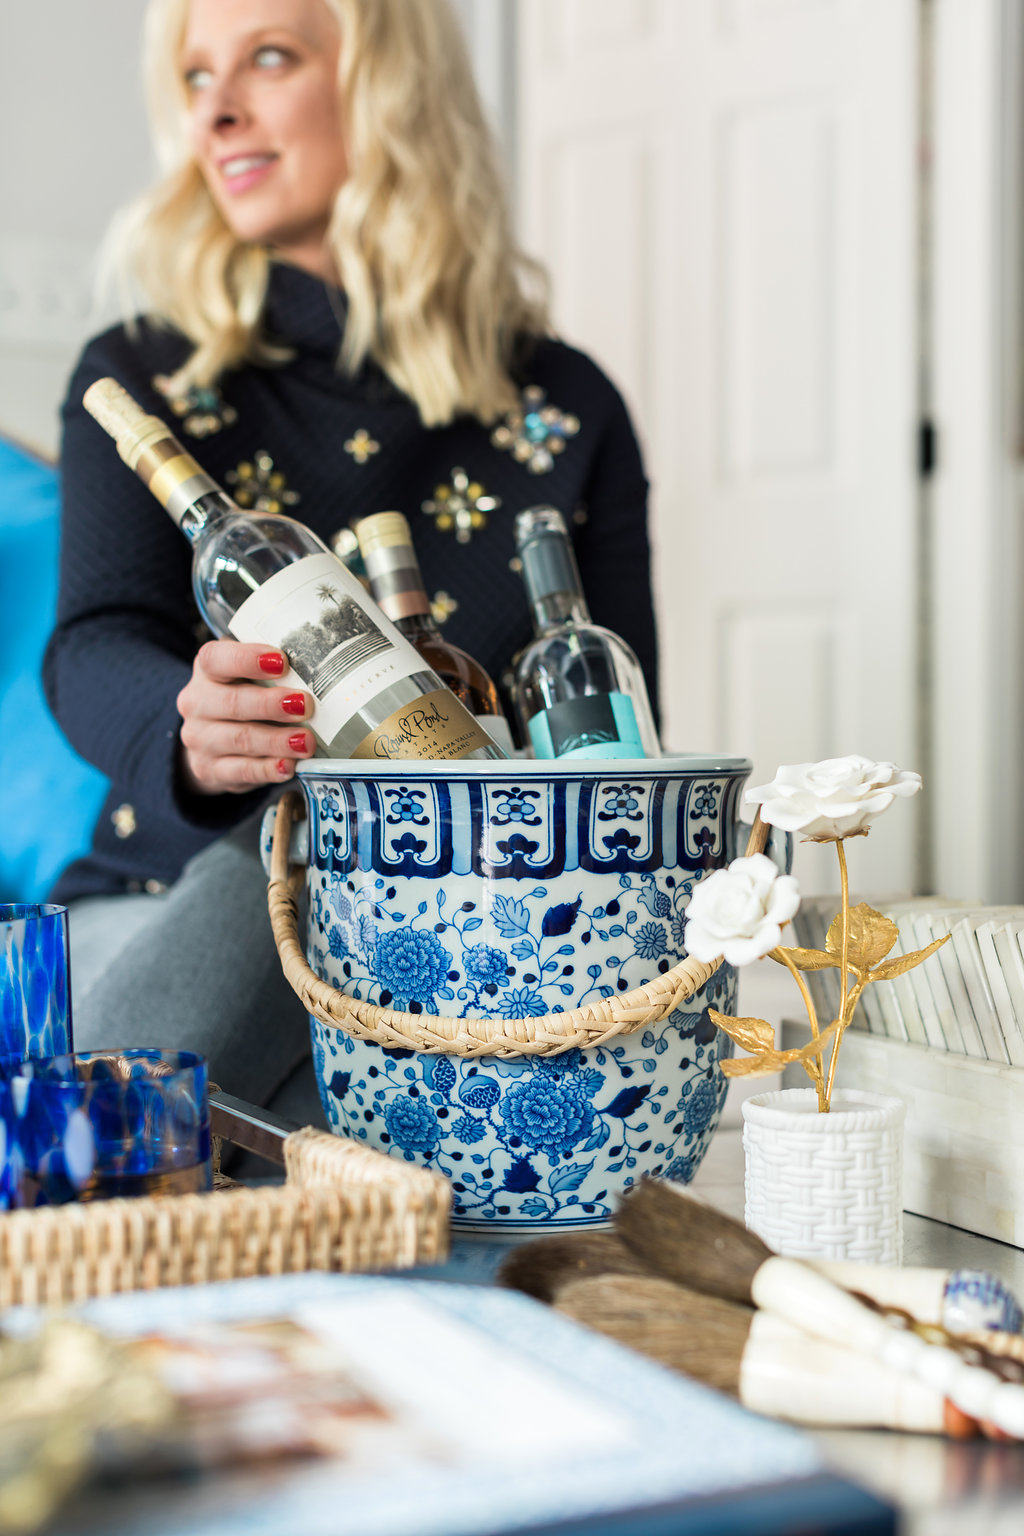 Blue Ginger Jar Champagne Bucket, AERIN x Williams-Sonoma | waitingonmartha.com